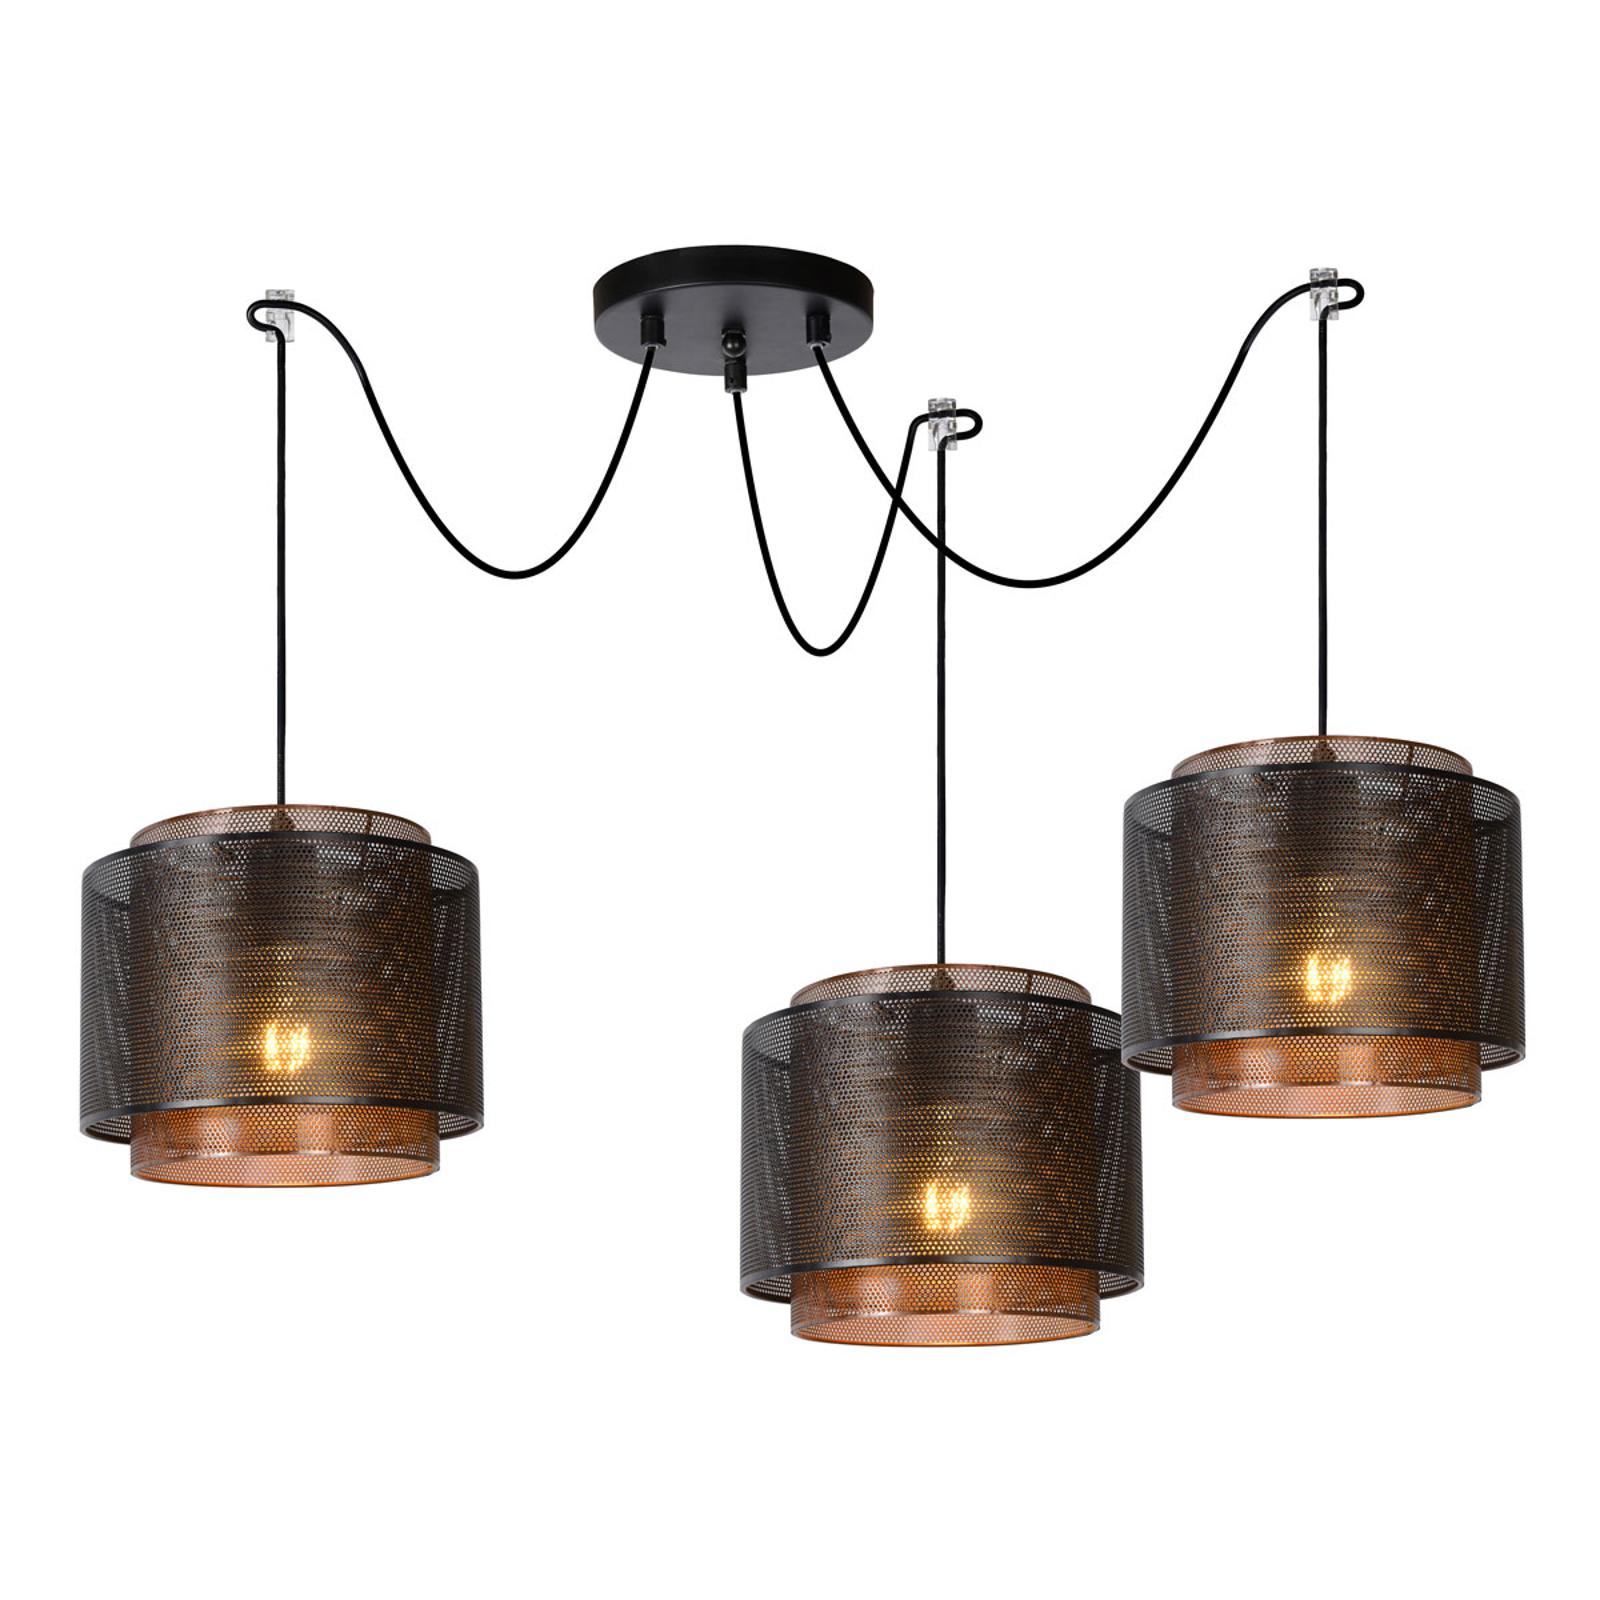 Lampa wisząca Orrin z metalu, 3-punktowa